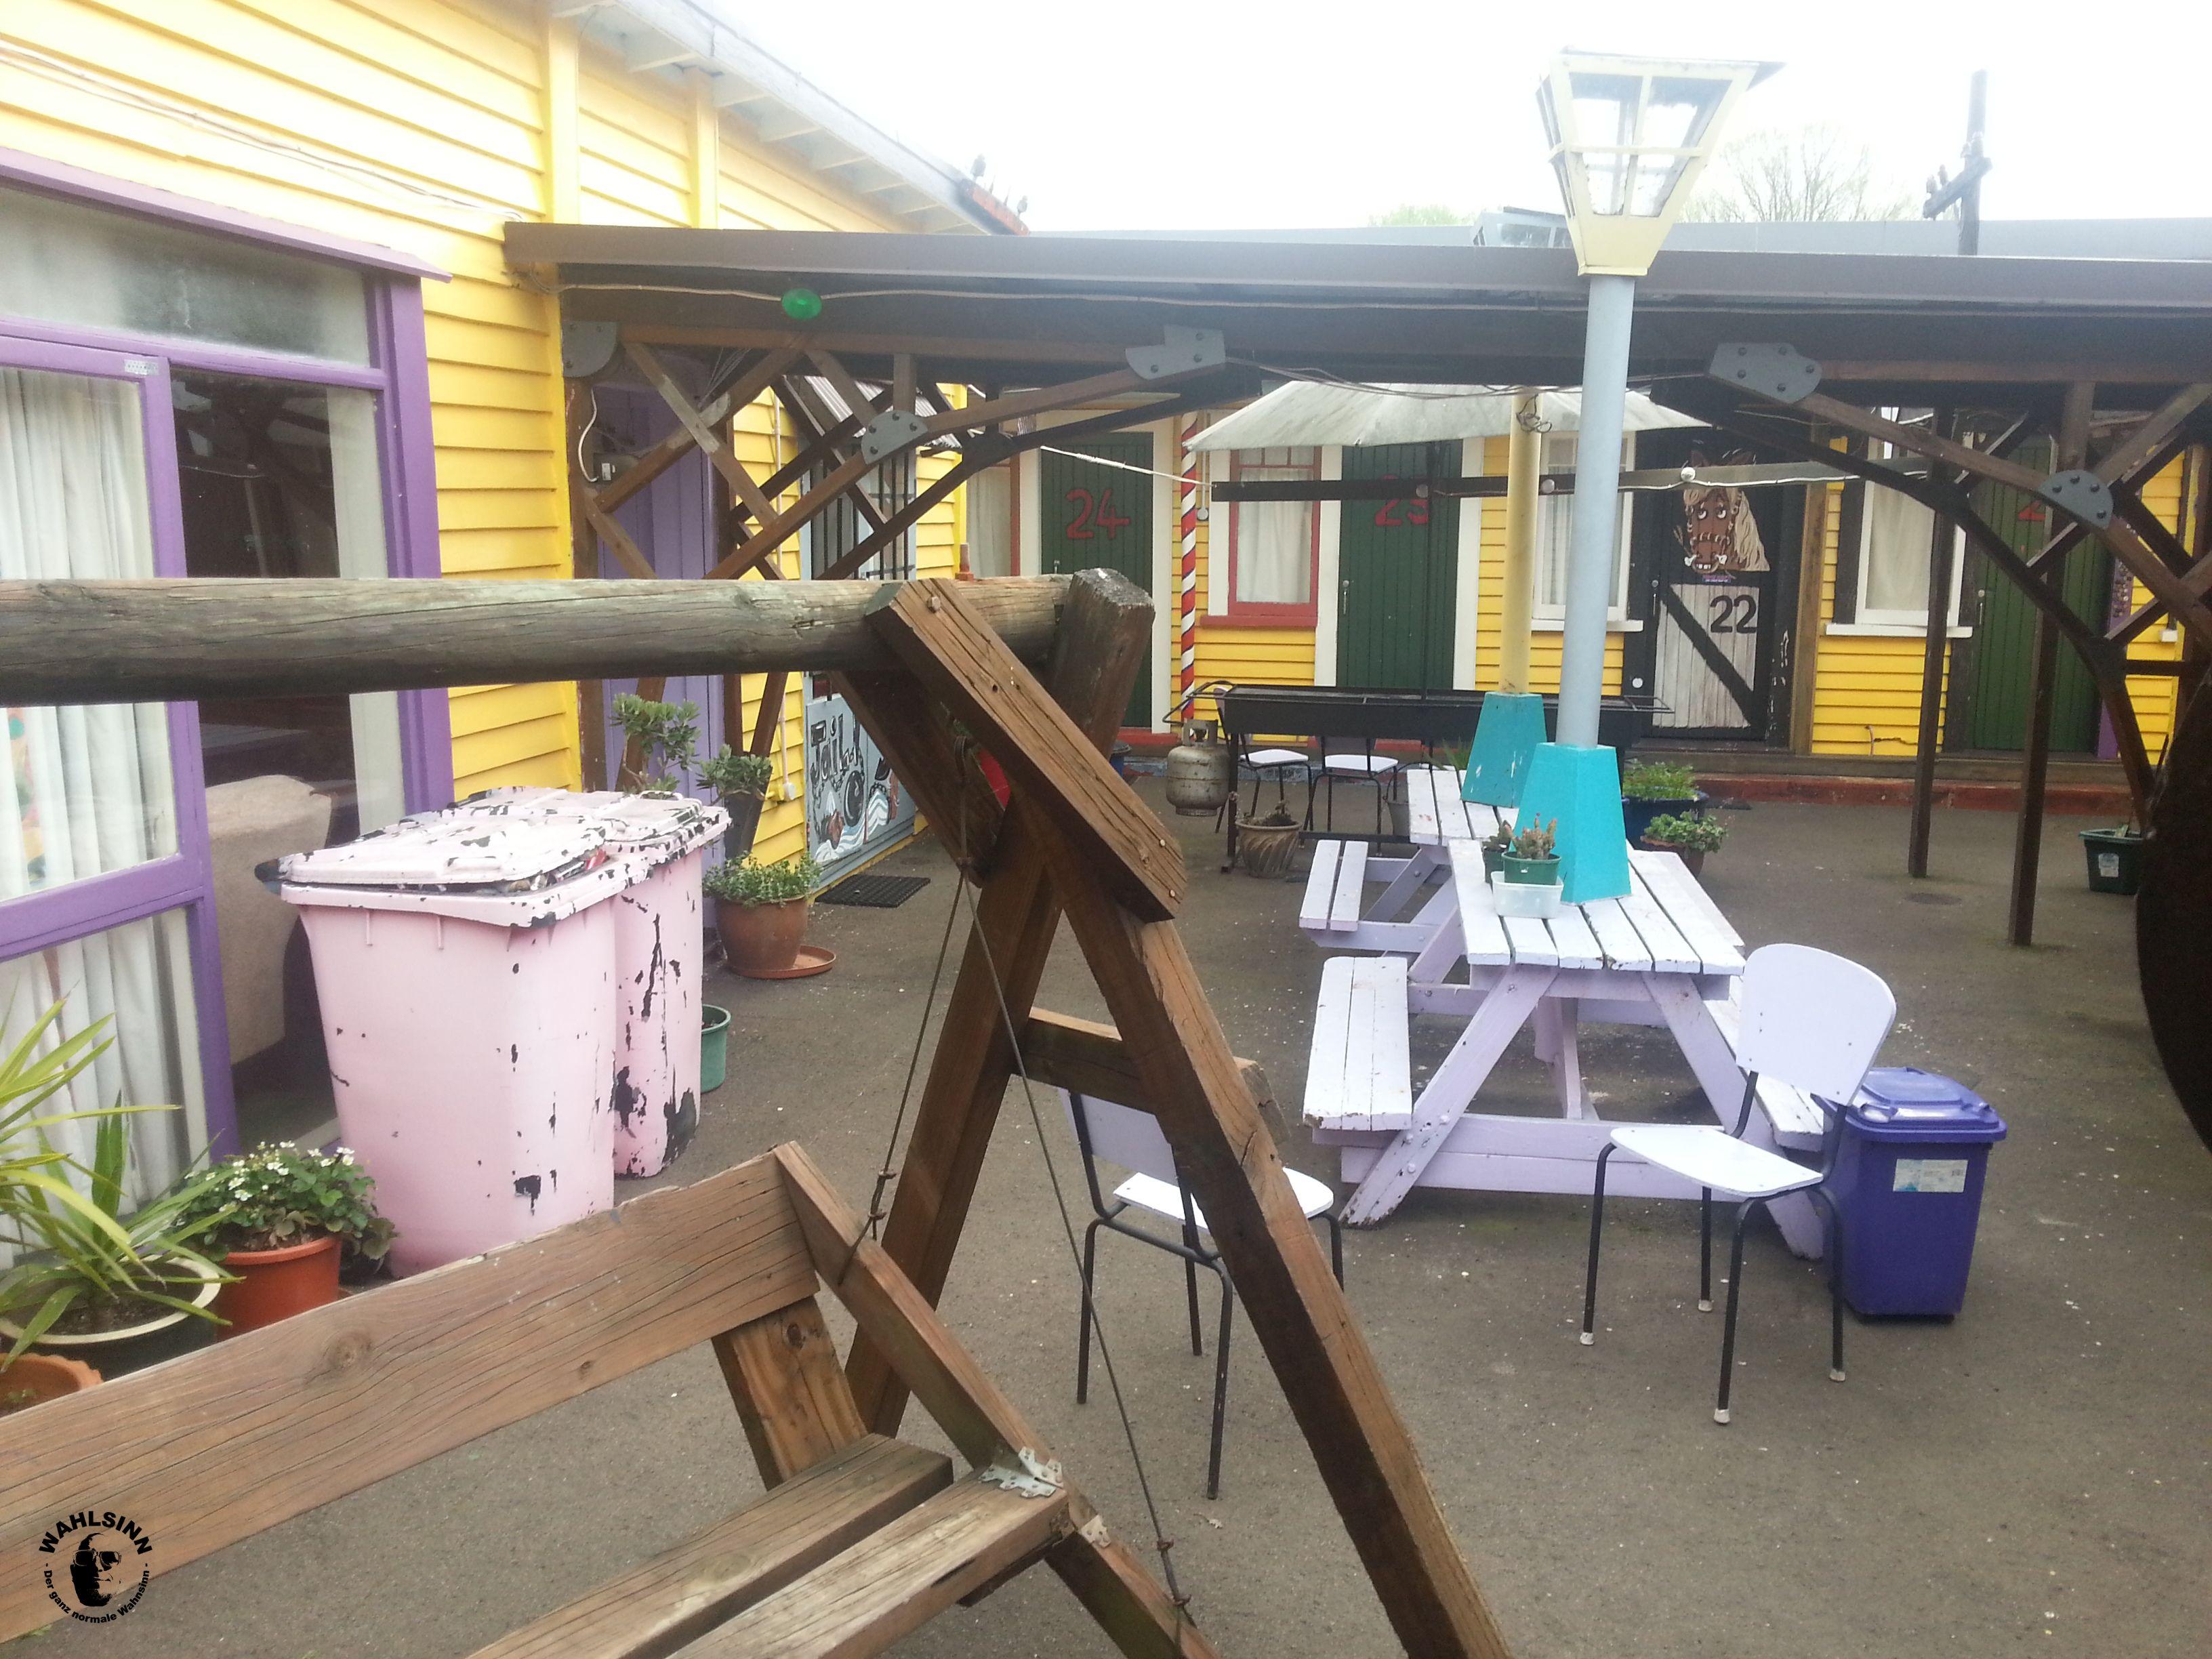 Der Innenhof vom Cactus Jack Hostel in Rotorua (Neuseeland)